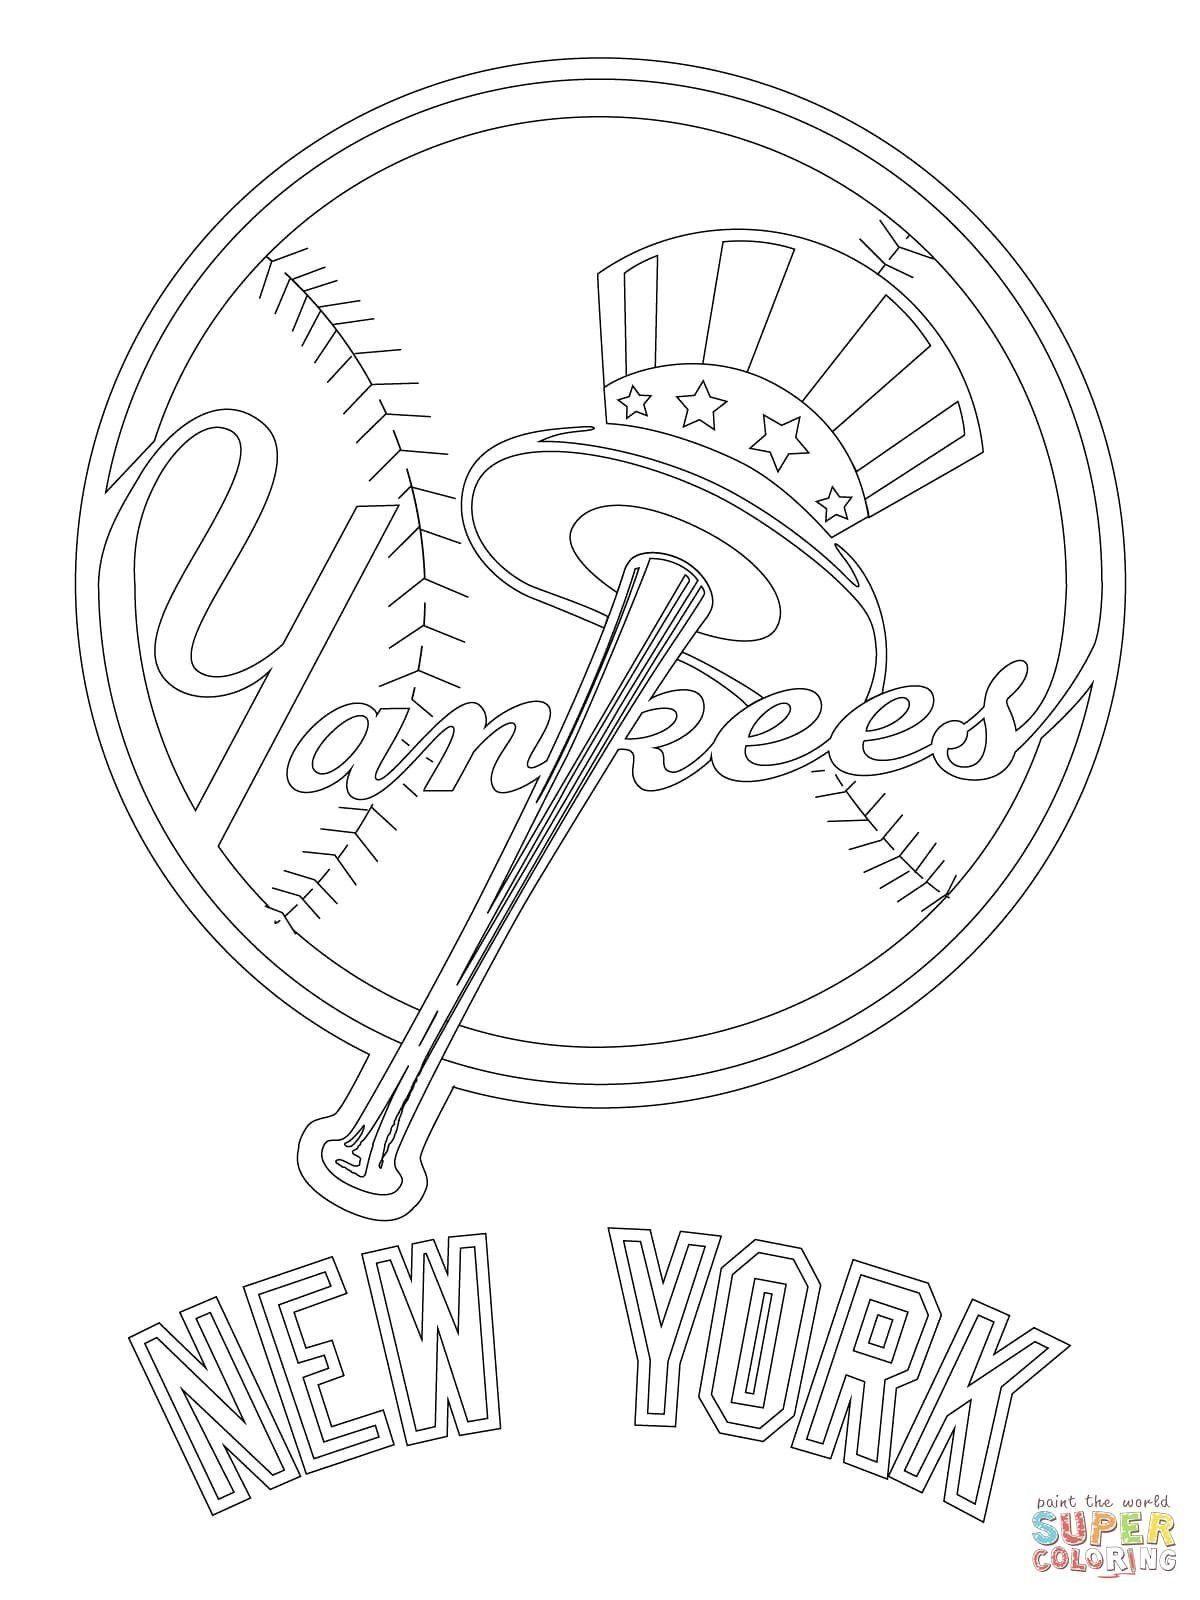 New York Yankees Coloring Lovely New Coloring Pages Yankees Baseball Coloring Pages New York Yankees Logo Yankees Logo